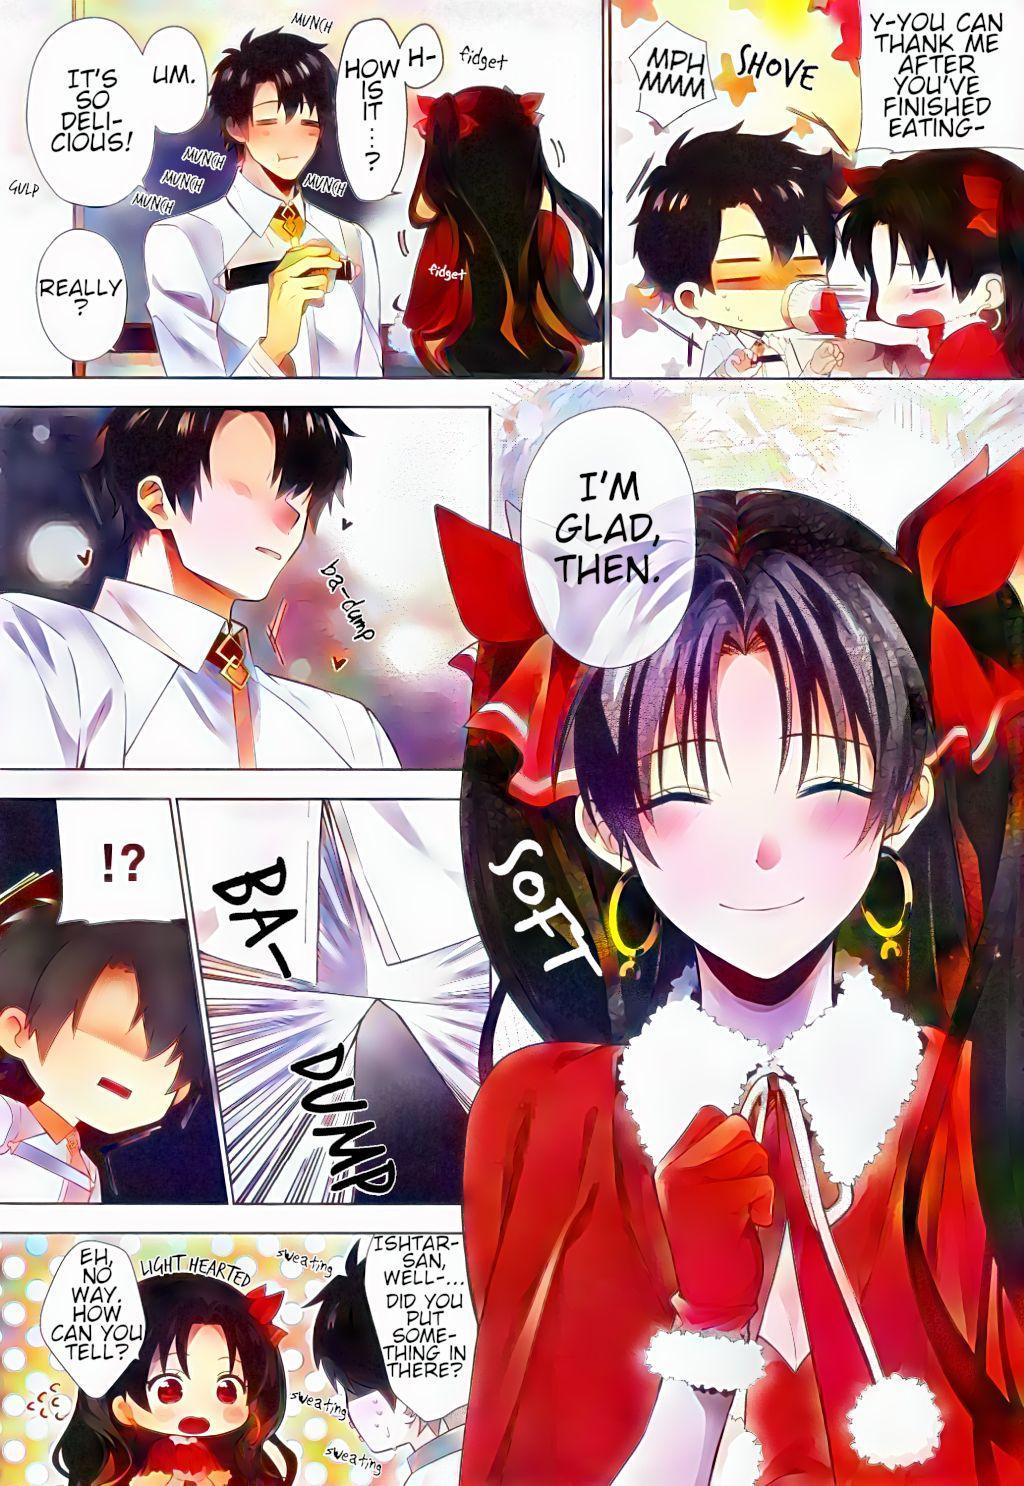 Kimi to Seinaru Yoru ni | On this holy night with you 2